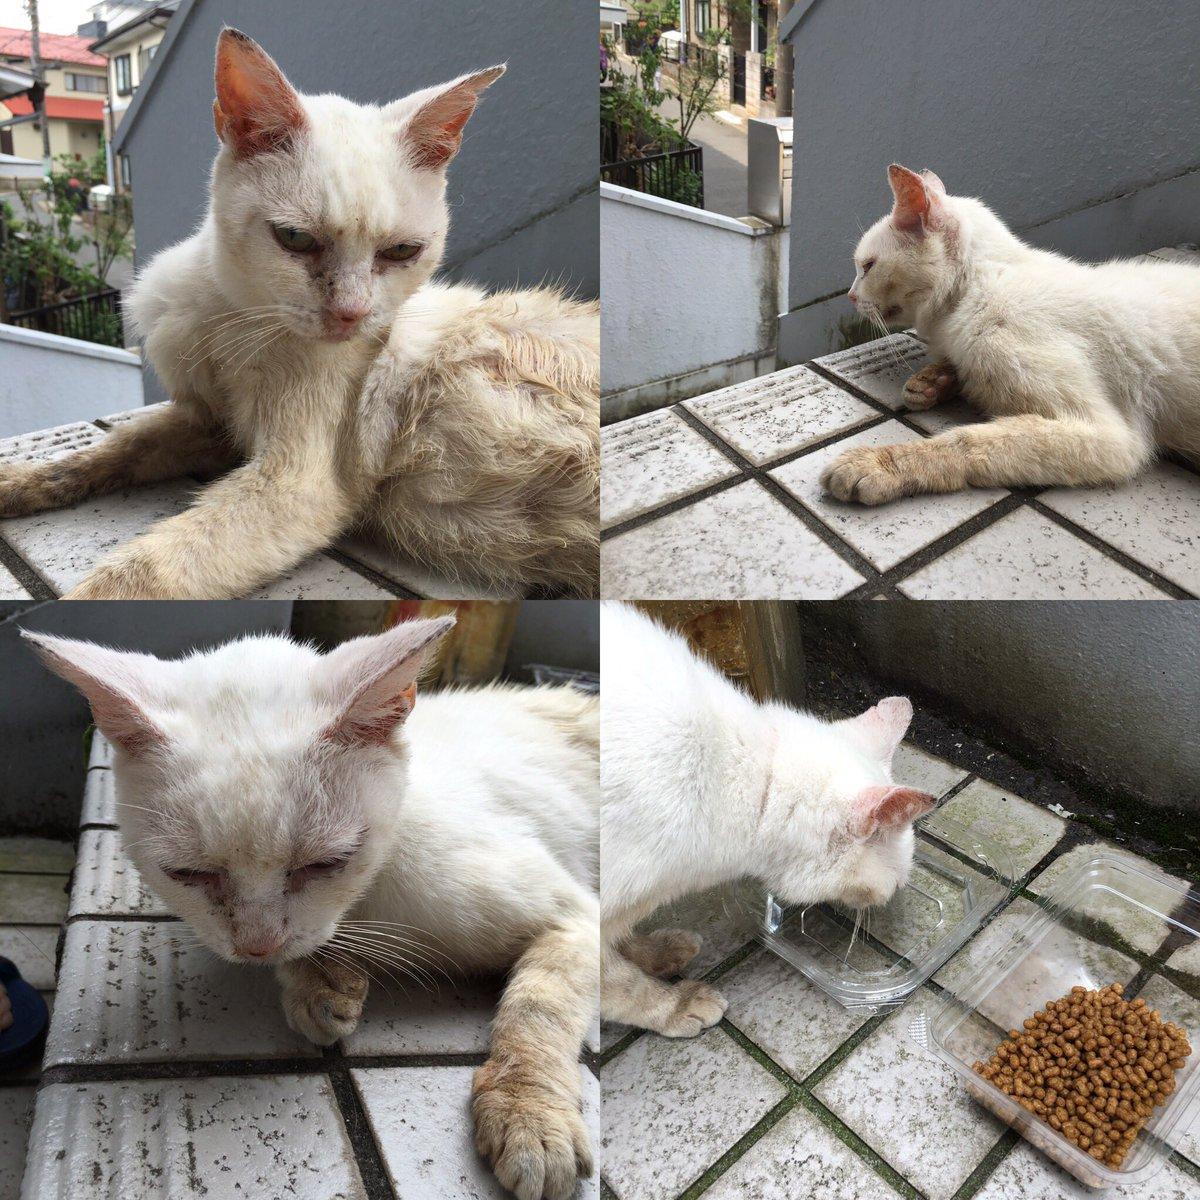 @miyachan_888 @hiromiyucoo 外猫迷い猫のシロさん、すごく人なっこいです。首輪の後もあり飼われてたと思います。 https://t.co/7CddoCZFF2